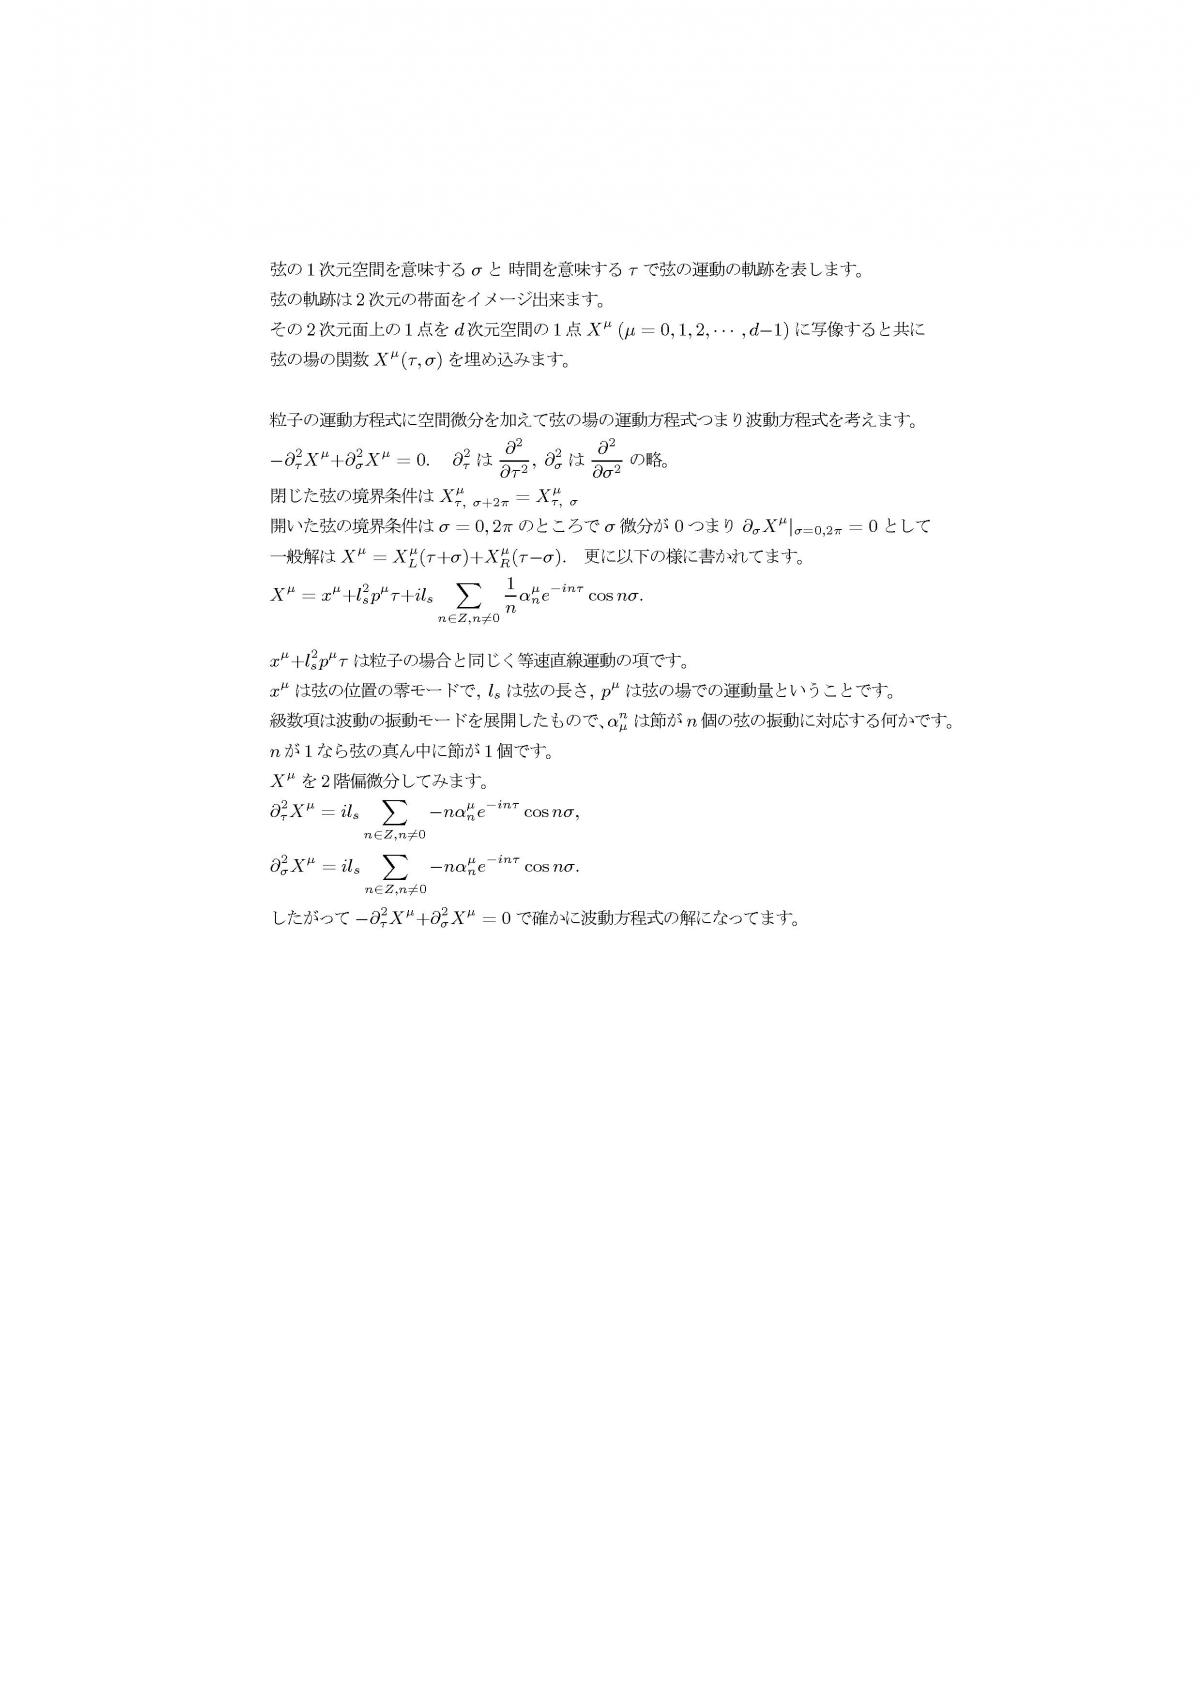 str04b.jpg